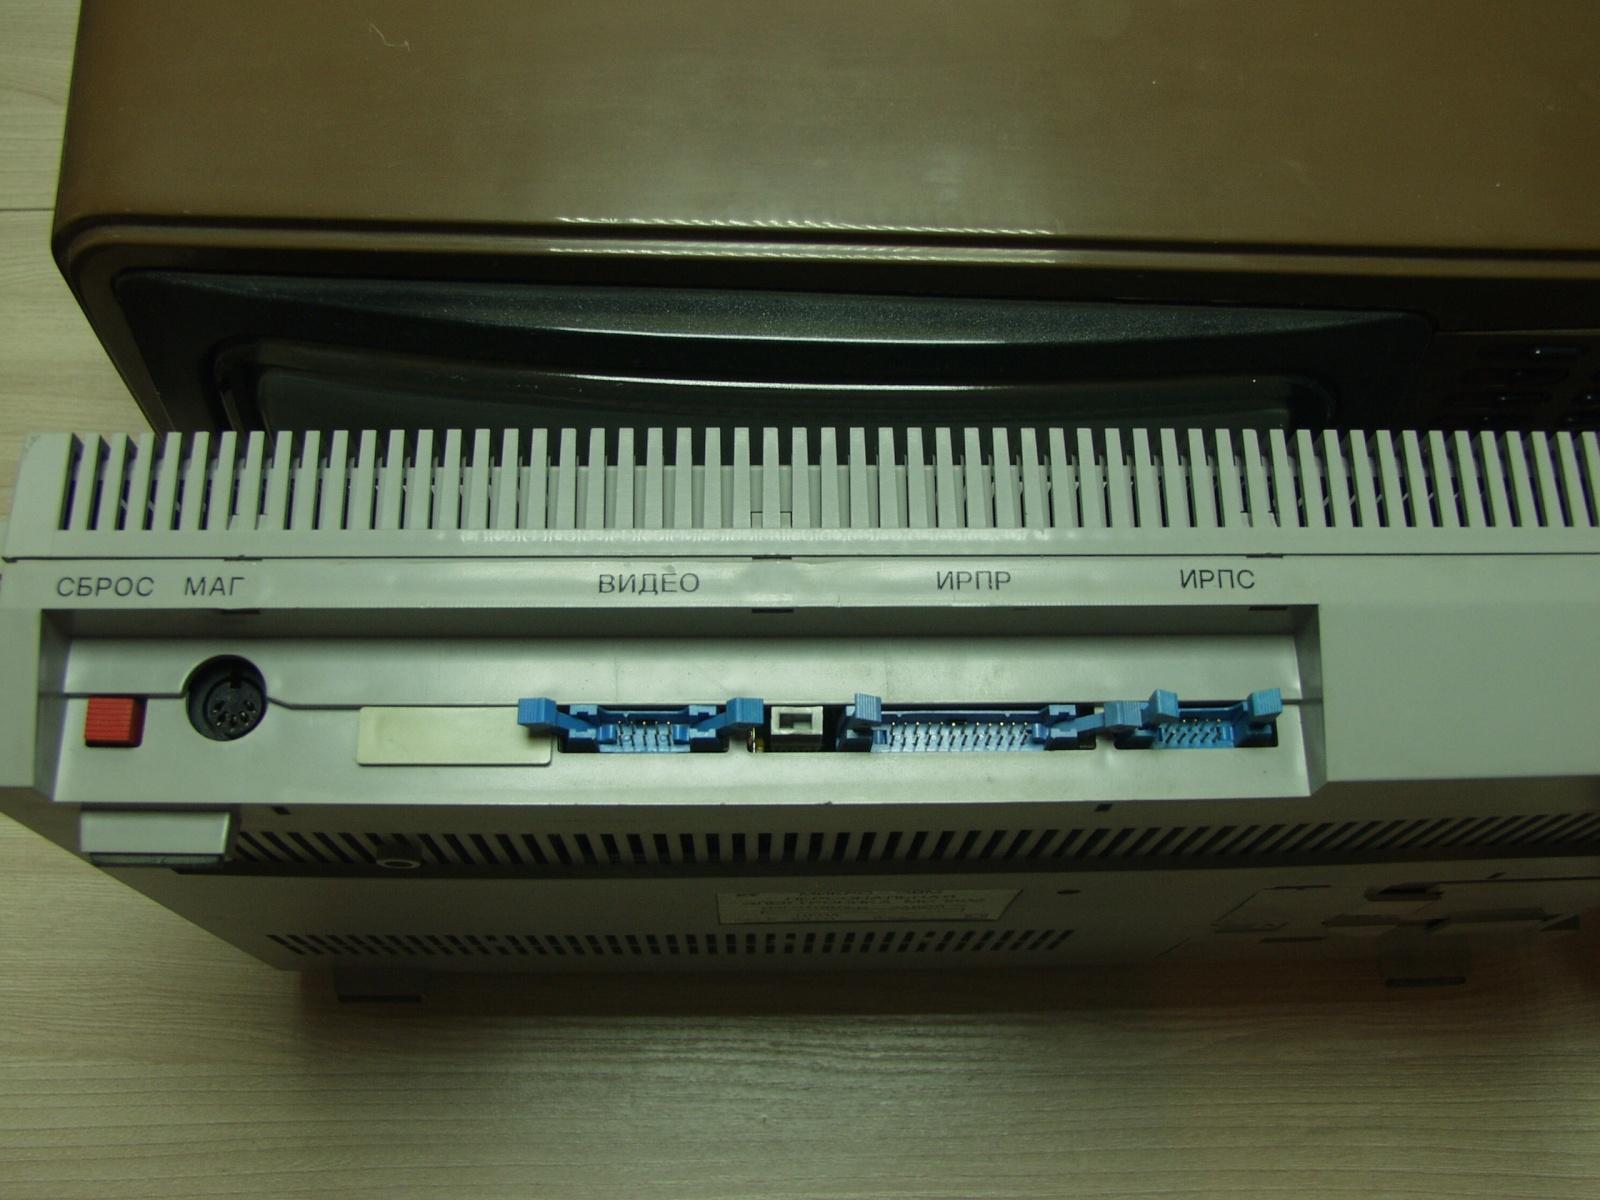 Советская IBM-PC Электроника МС-1502 - 3